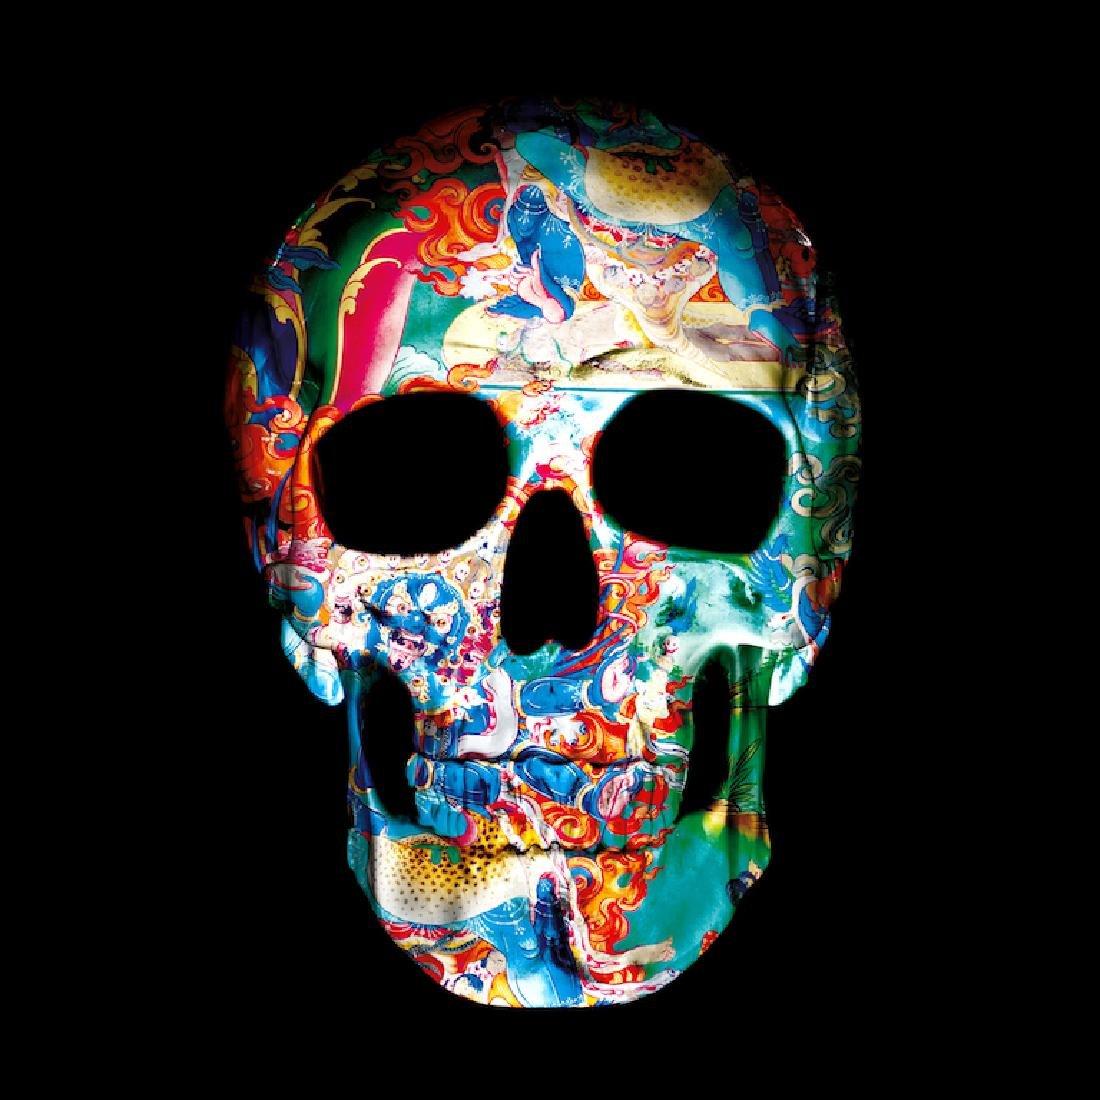 9 Dimensions of the Skull II | Unframed Platinum